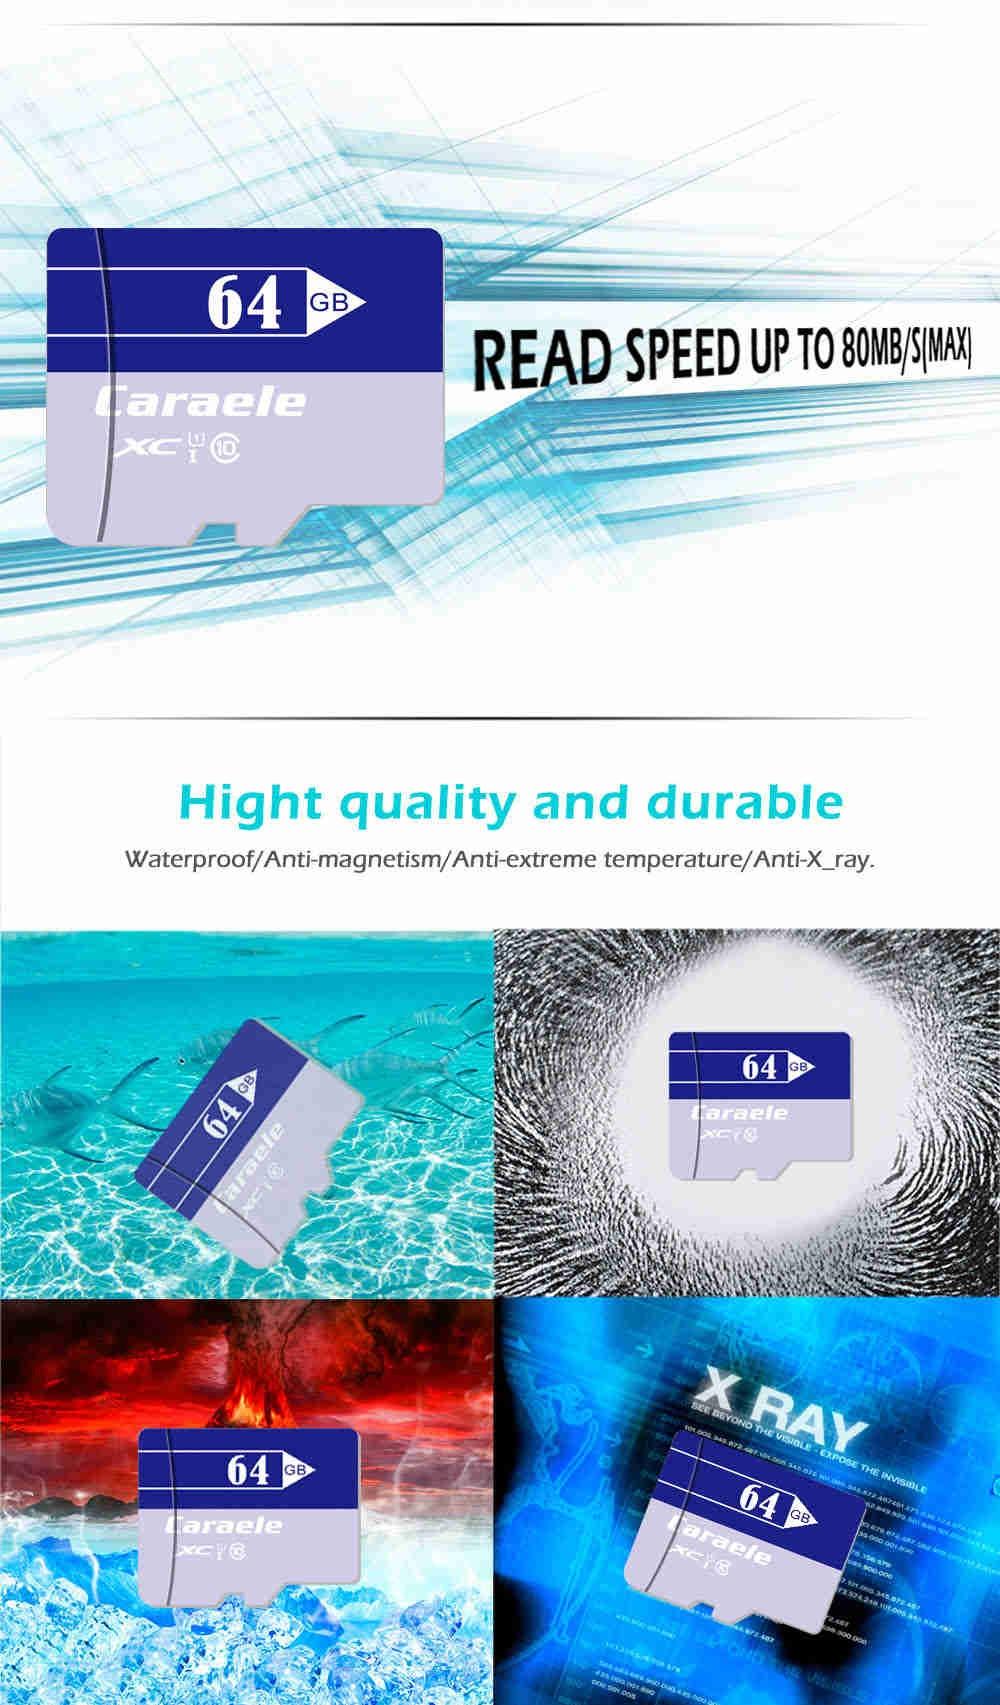 Caraele Multi-storage TF / Micro SD Memory Card XC Class 10 UHS-I